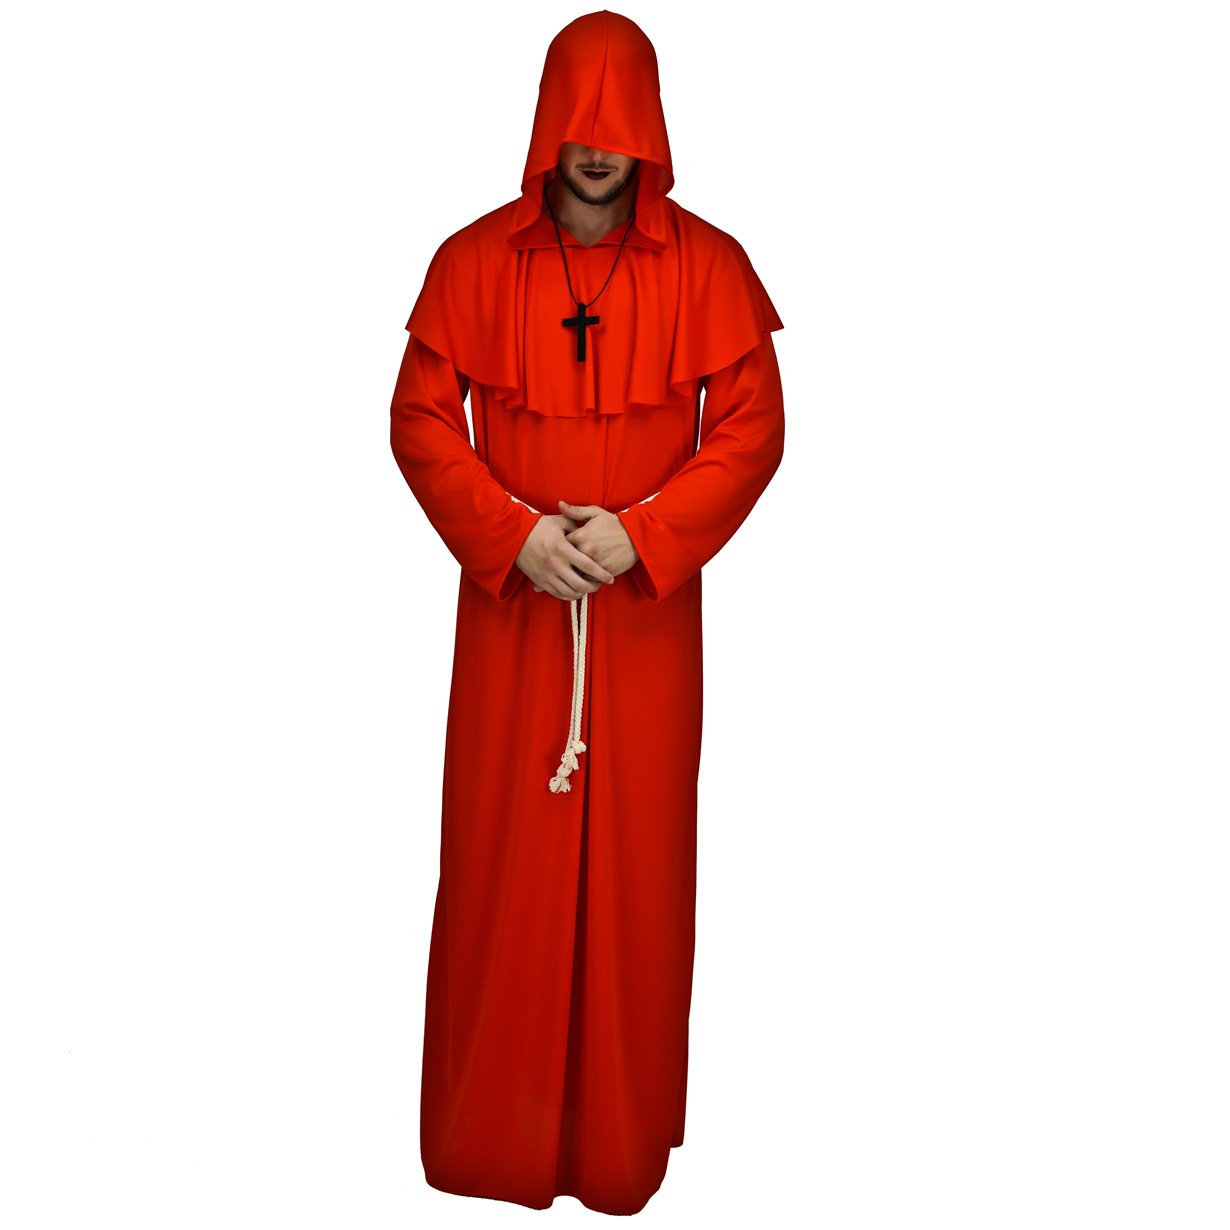 Amazon.com: flatwhite para hombre midievil monje disfraz ...